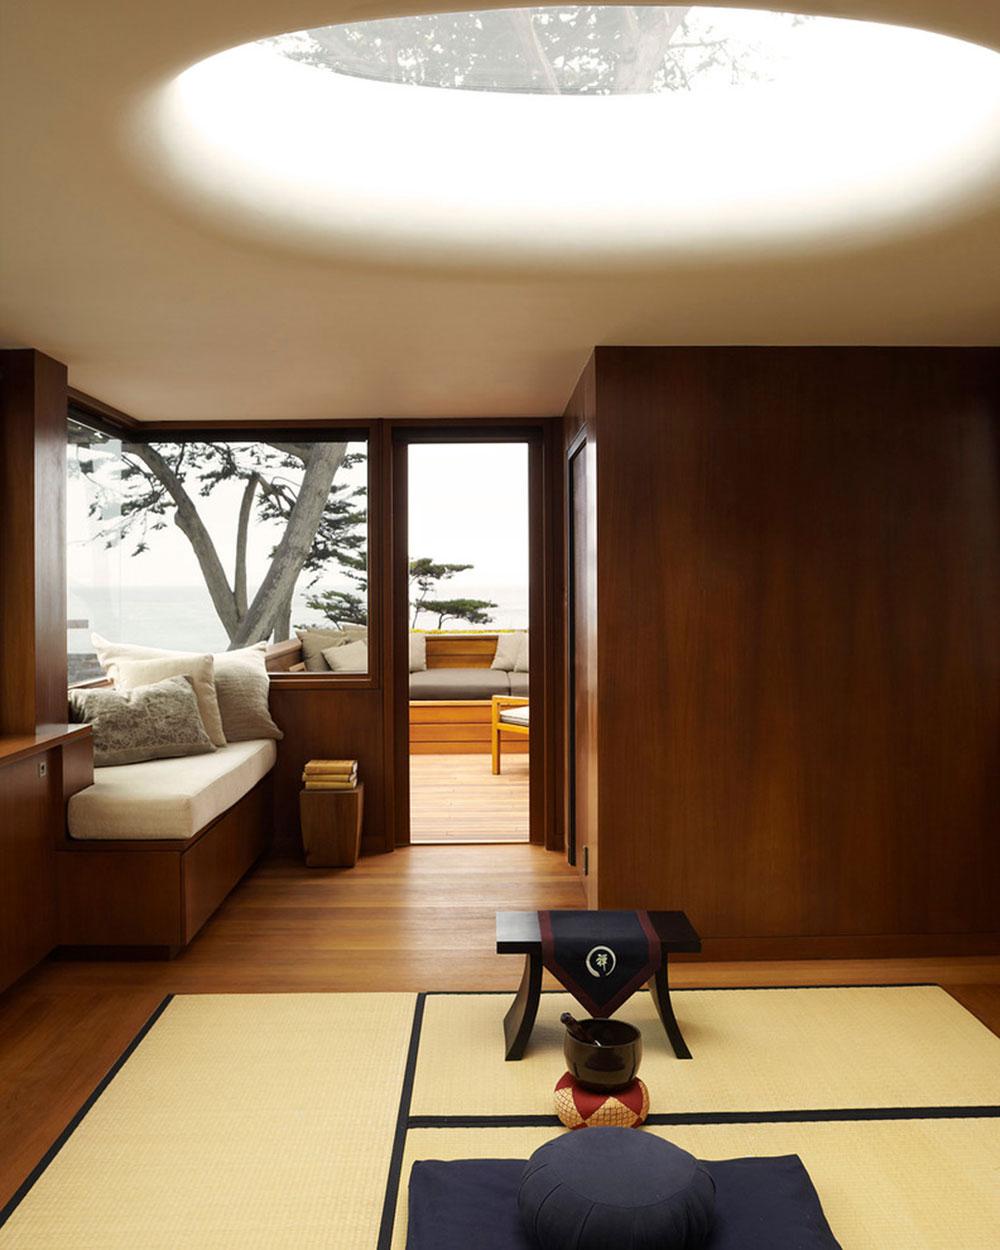 Meditation Room Ideas13 meditation room ideas